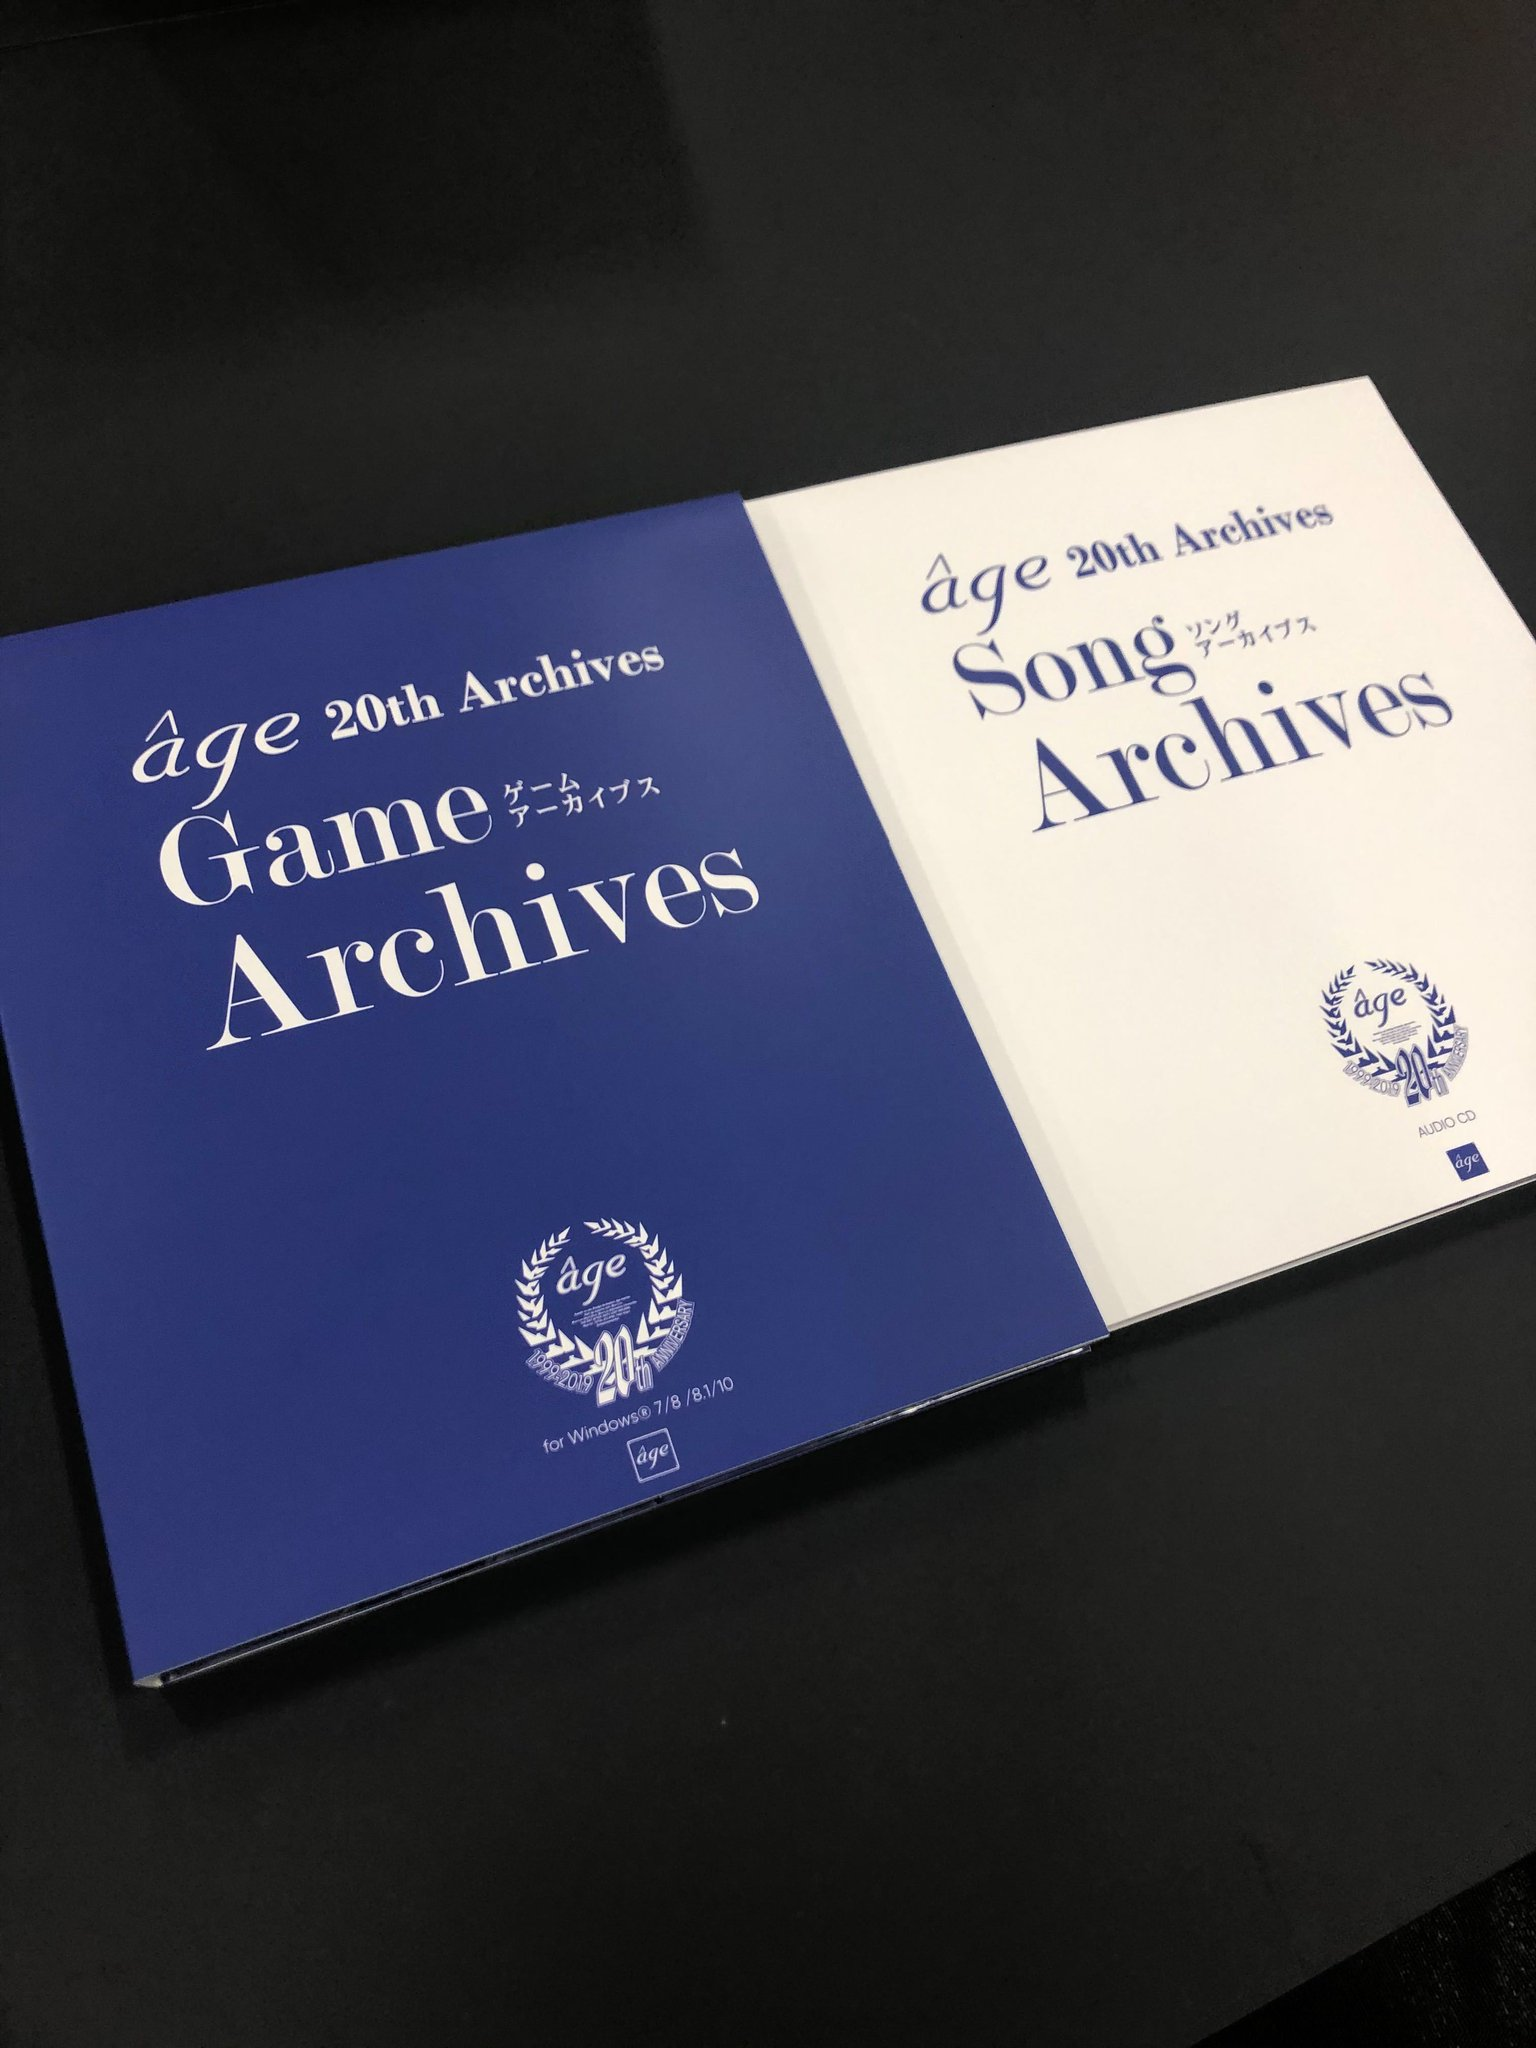 Âge アーカイブス 20thbox edition